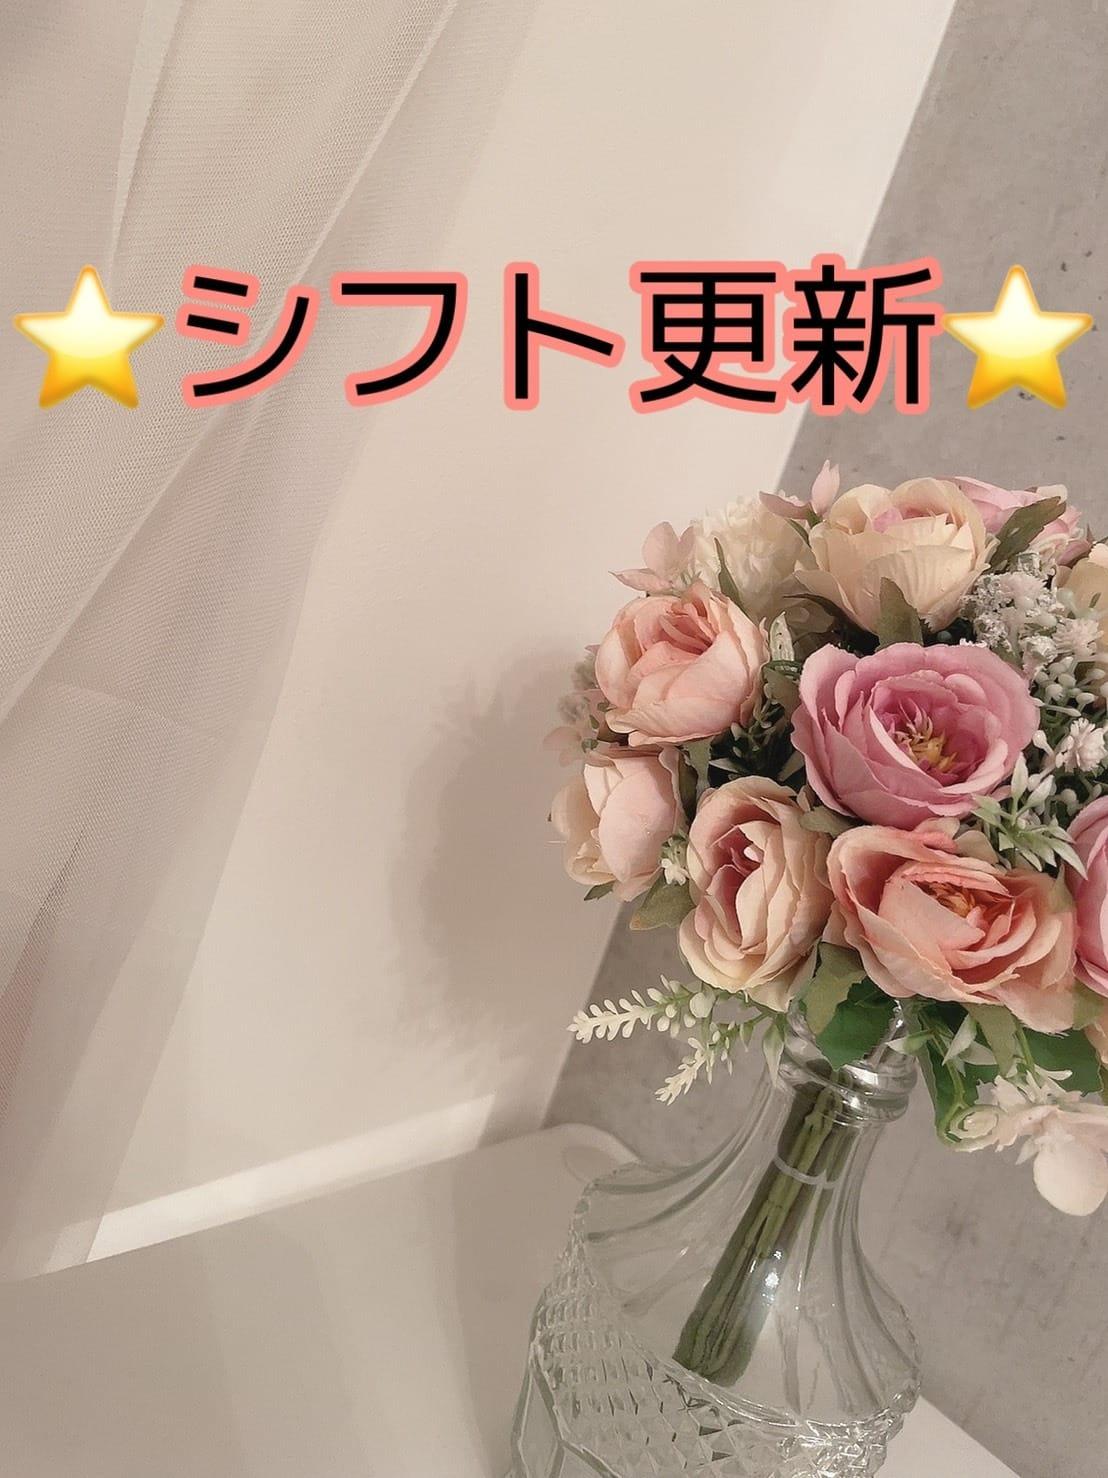 「⭐️シフト更新⭐️」06/12(土) 21:15   染井よしのの写メ日記